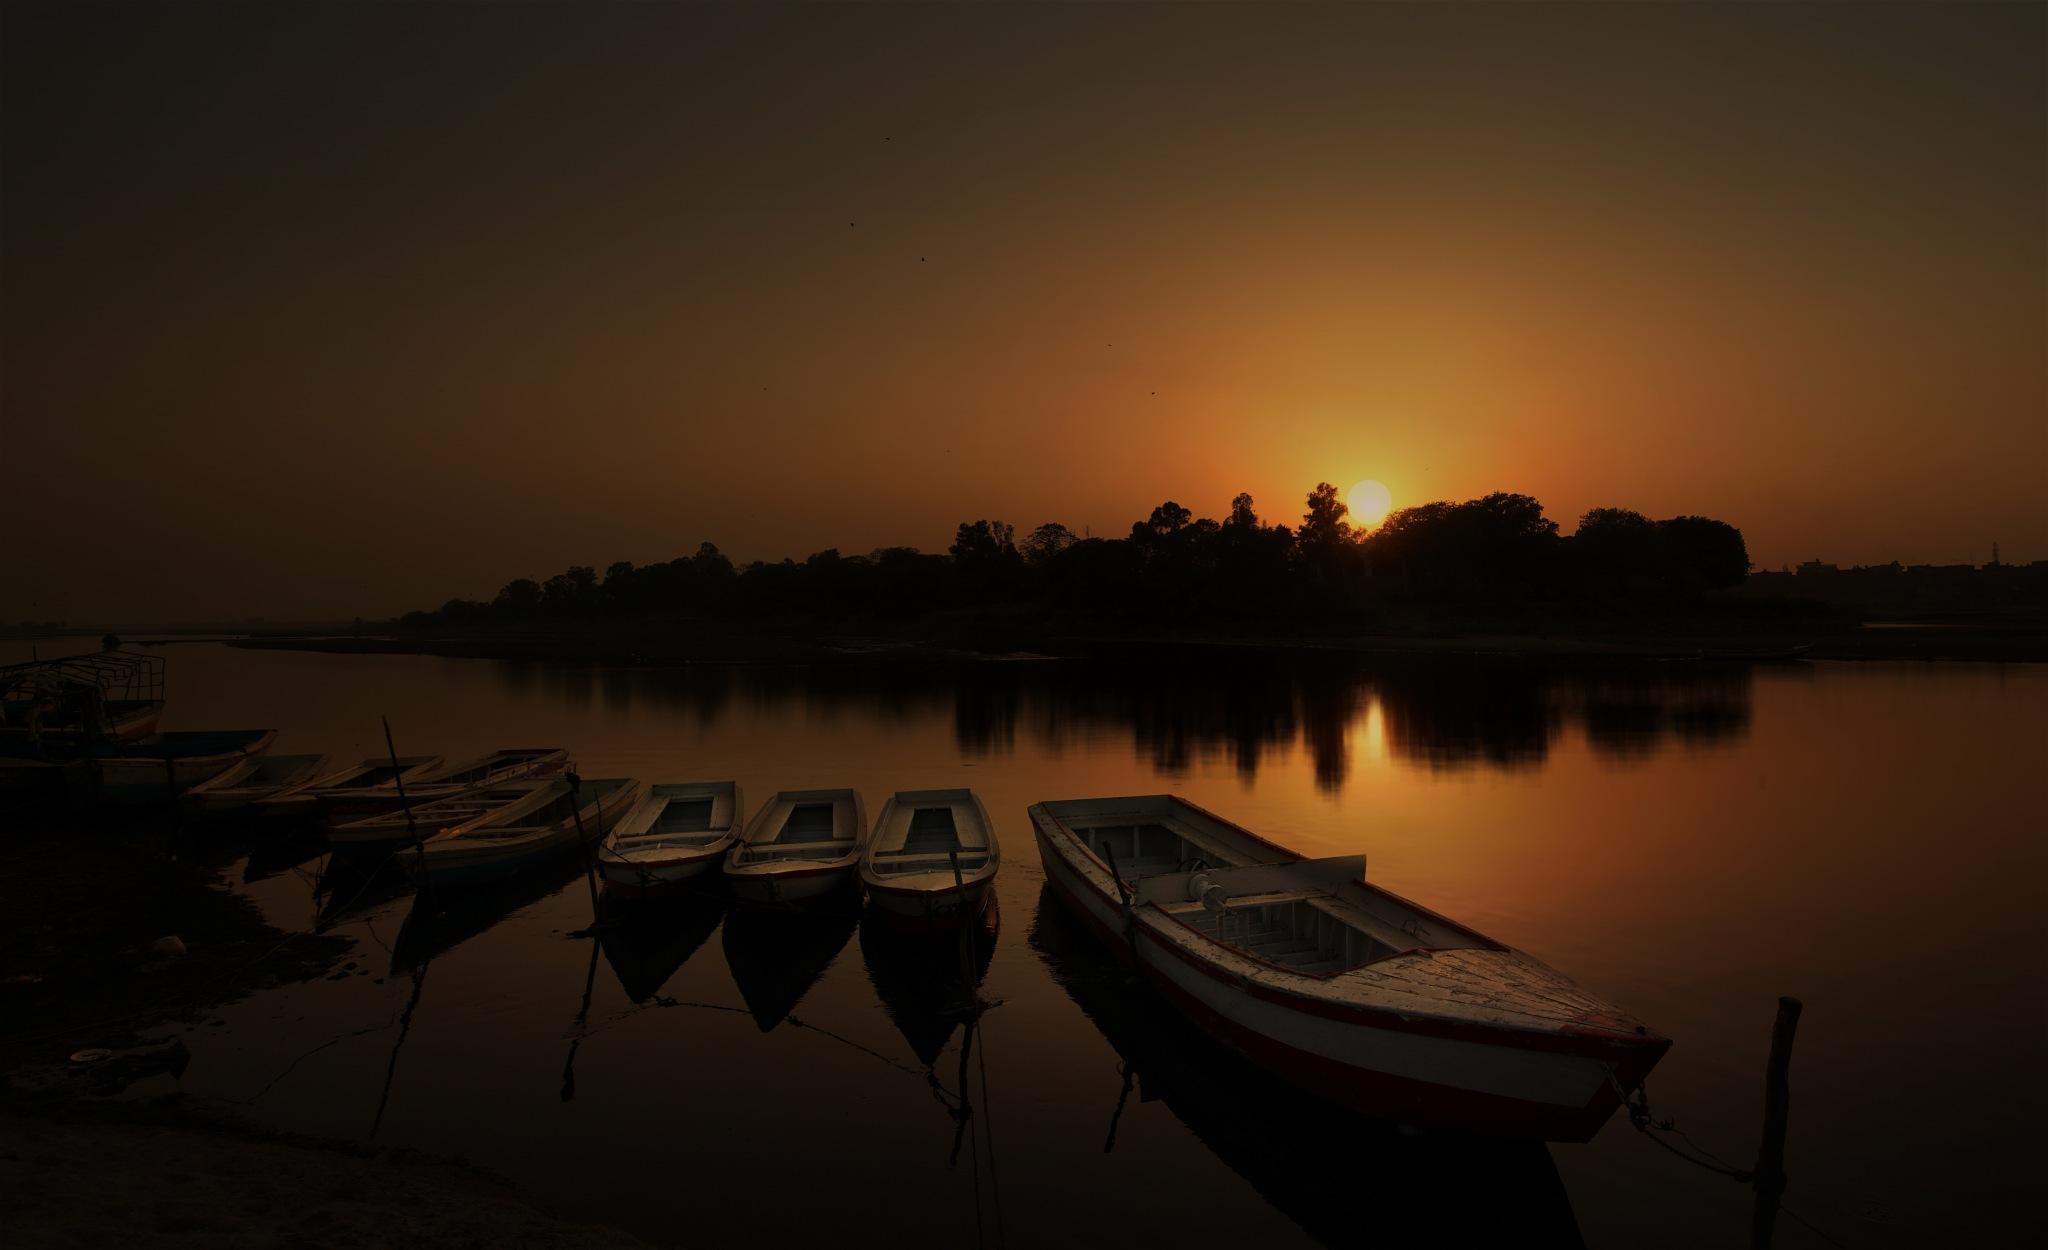 Sunset at Ravi by NavidQureshi